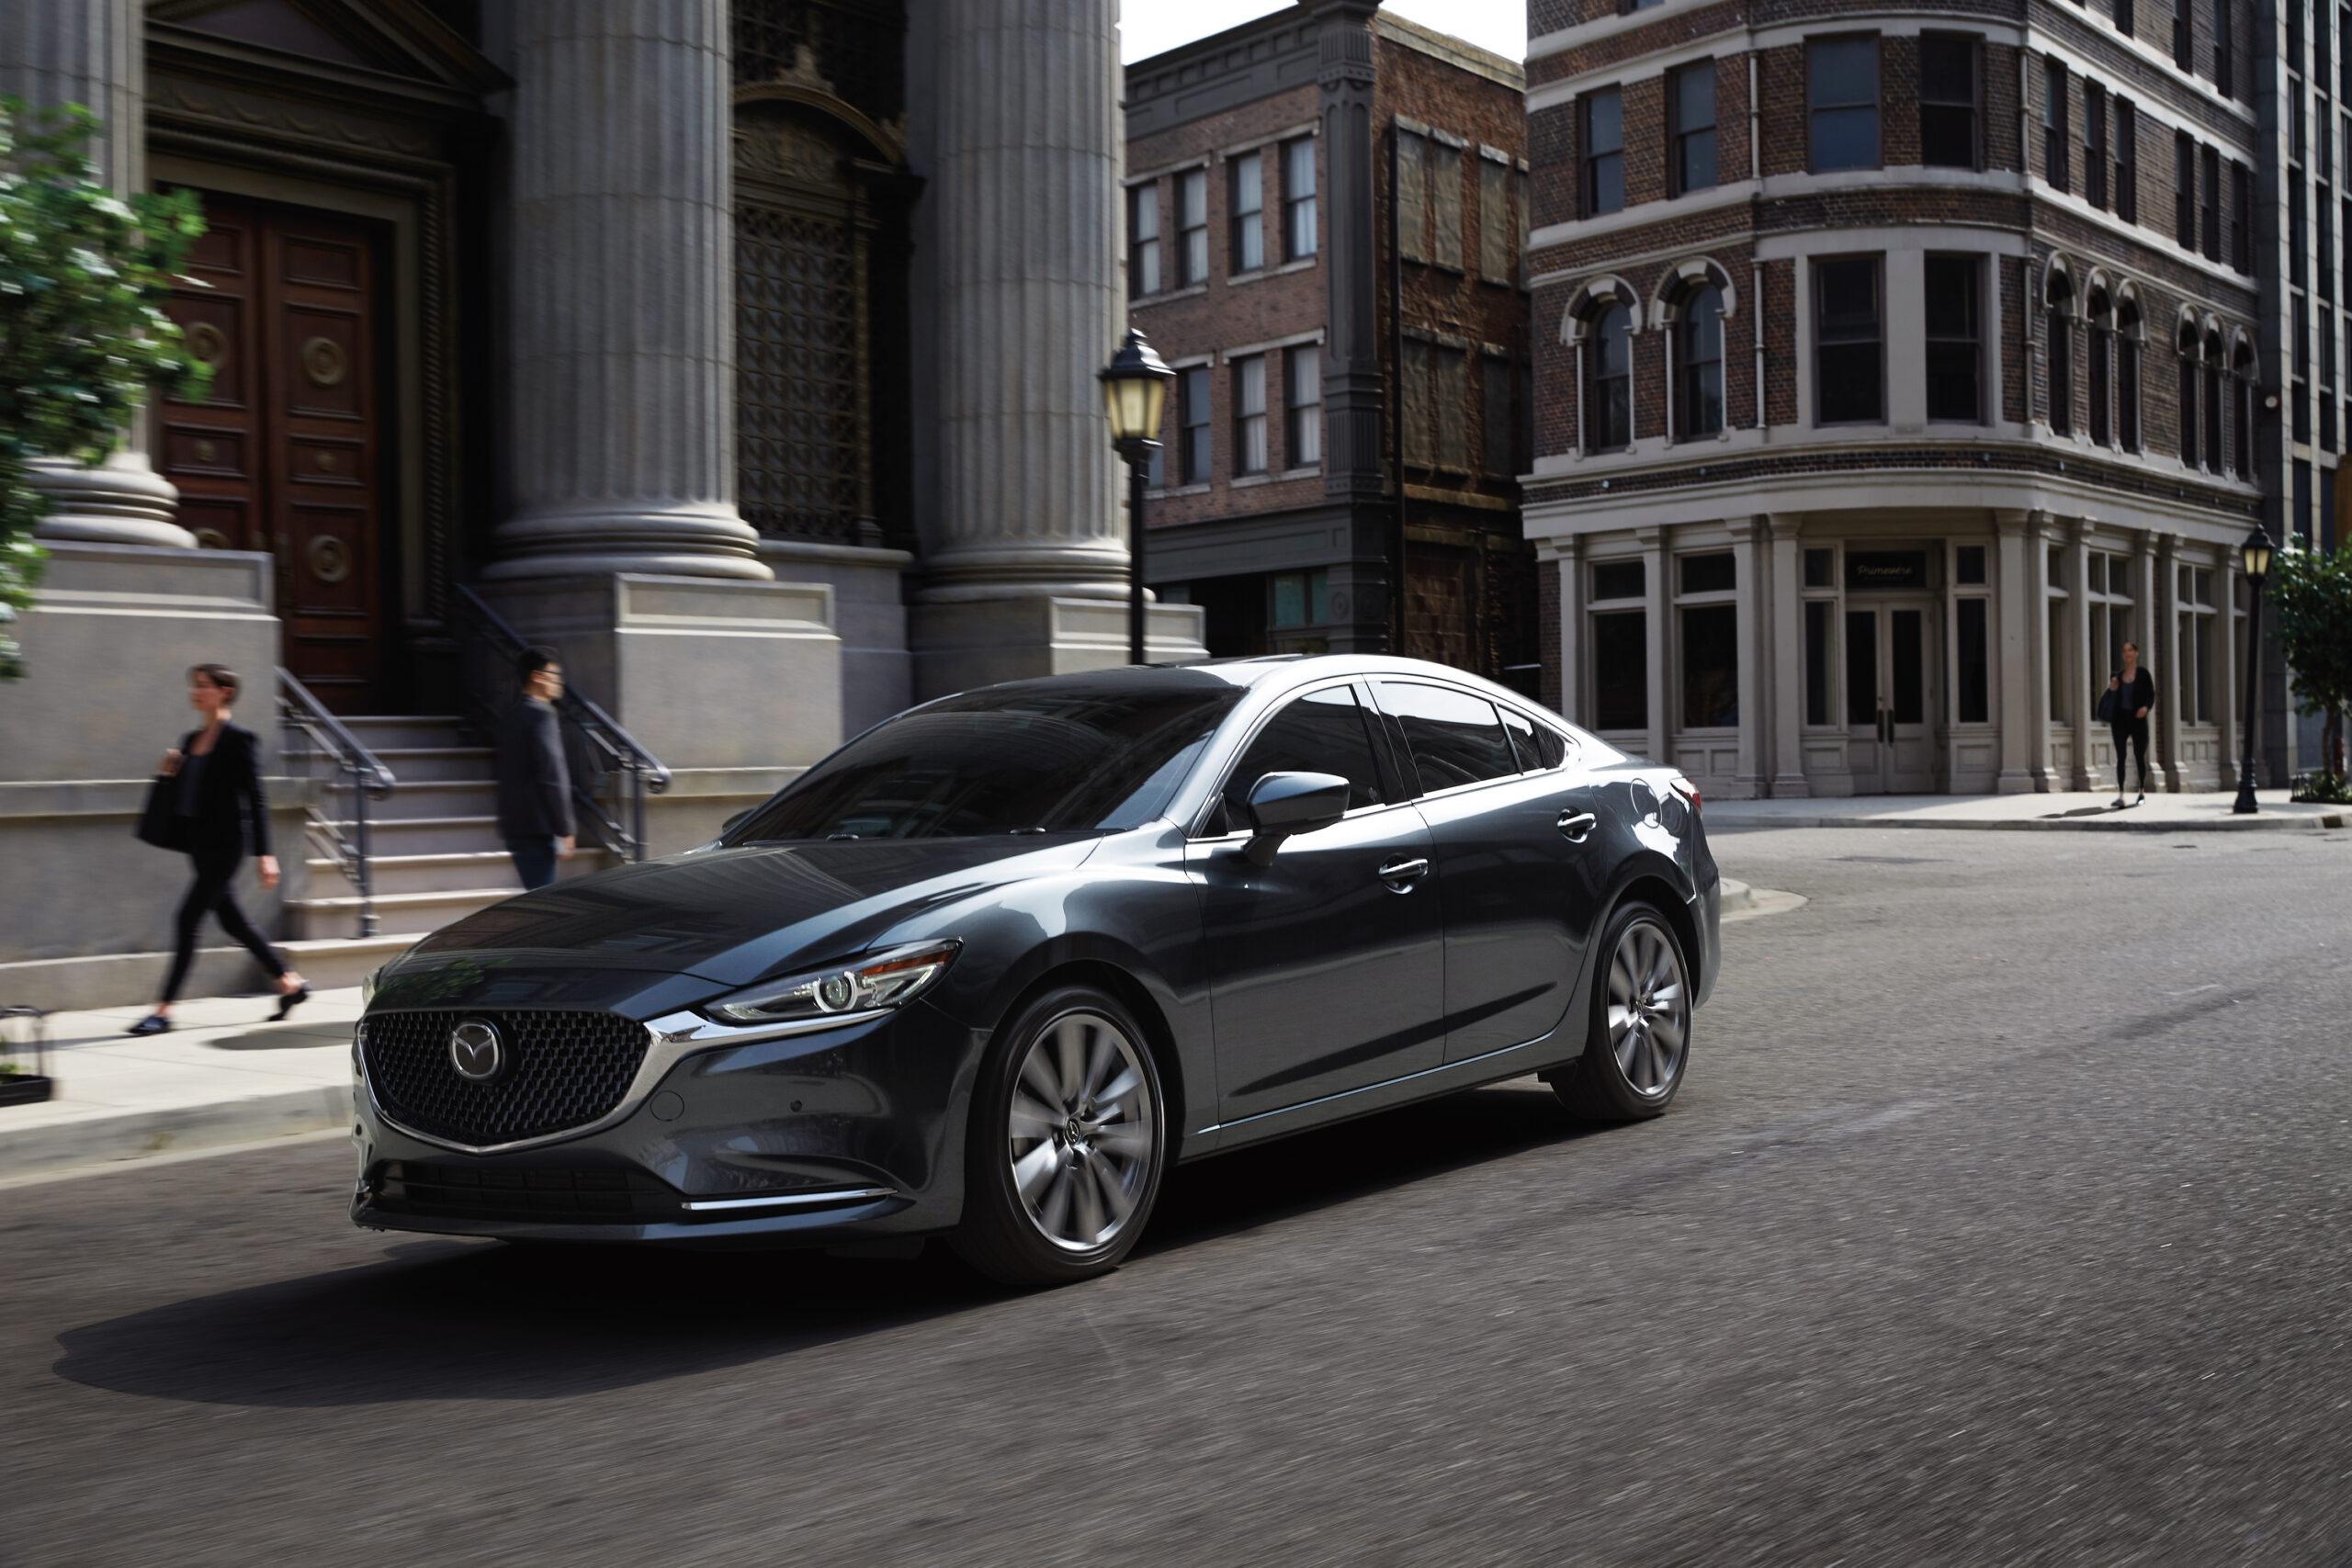 Kekurangan Mazda Z3 Spesifikasi